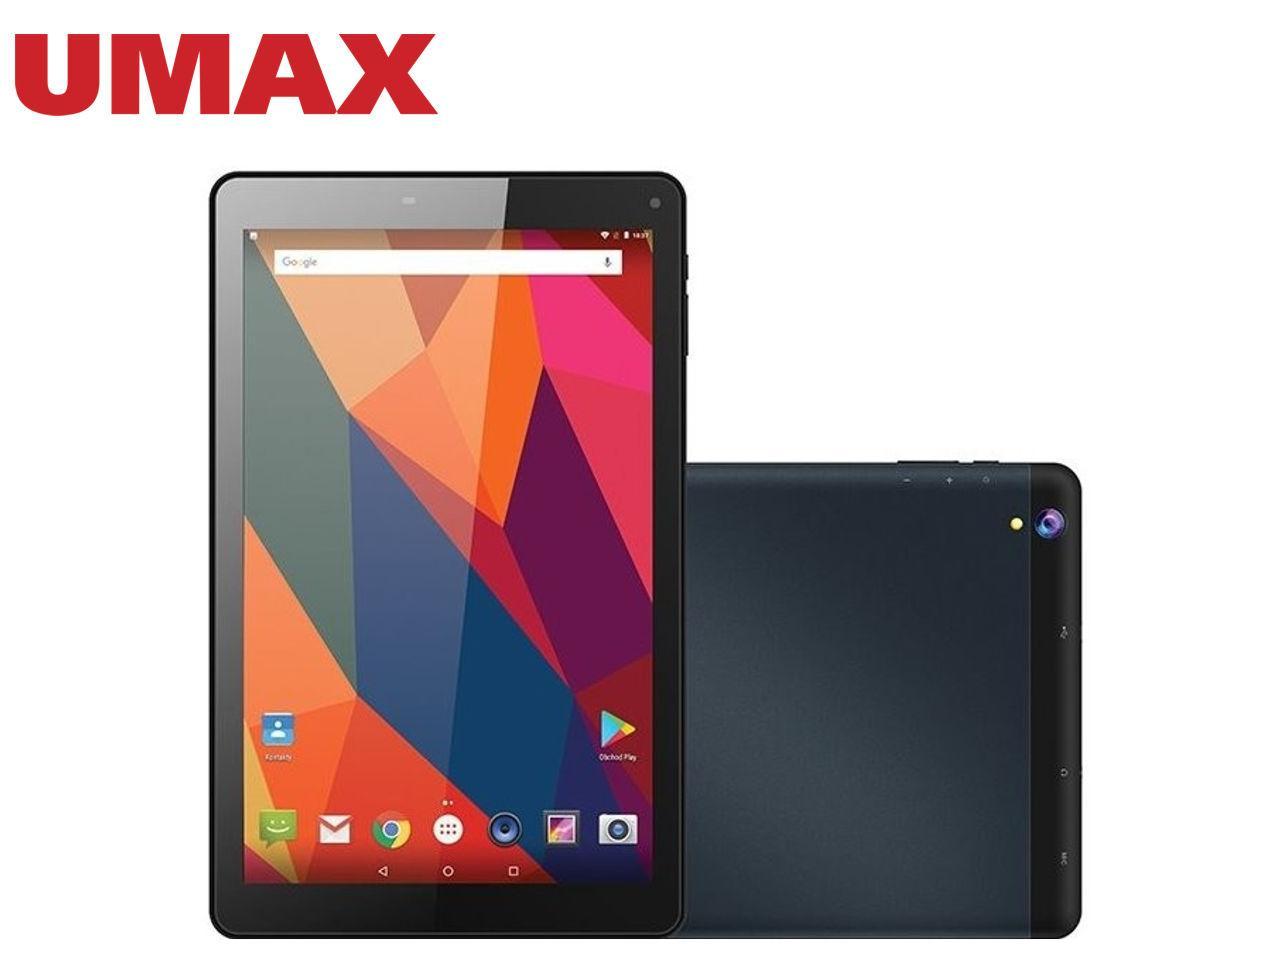 UMAX VisionBook 10Q Plus (UMM200V1M)